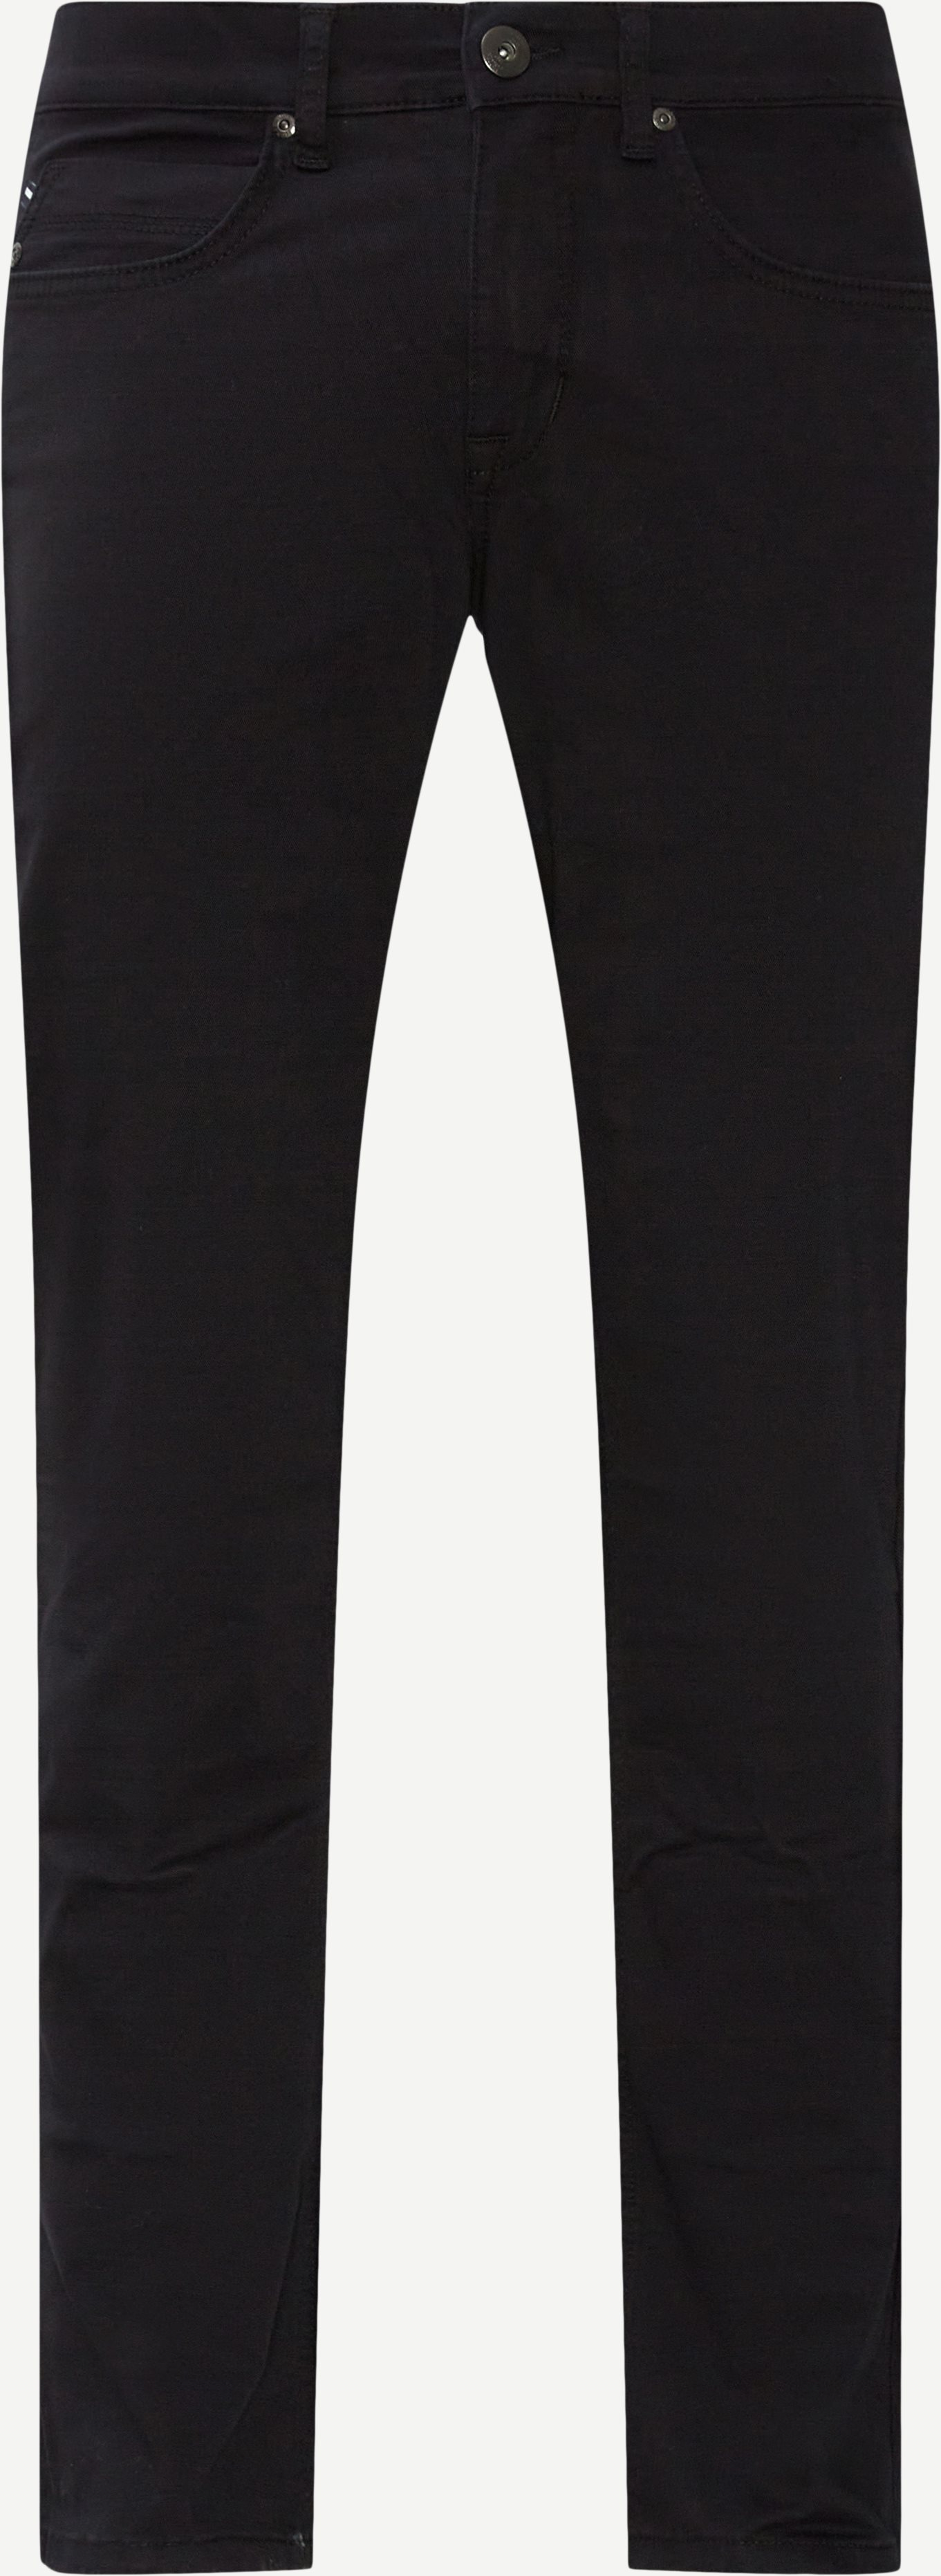 Jeans - Sort